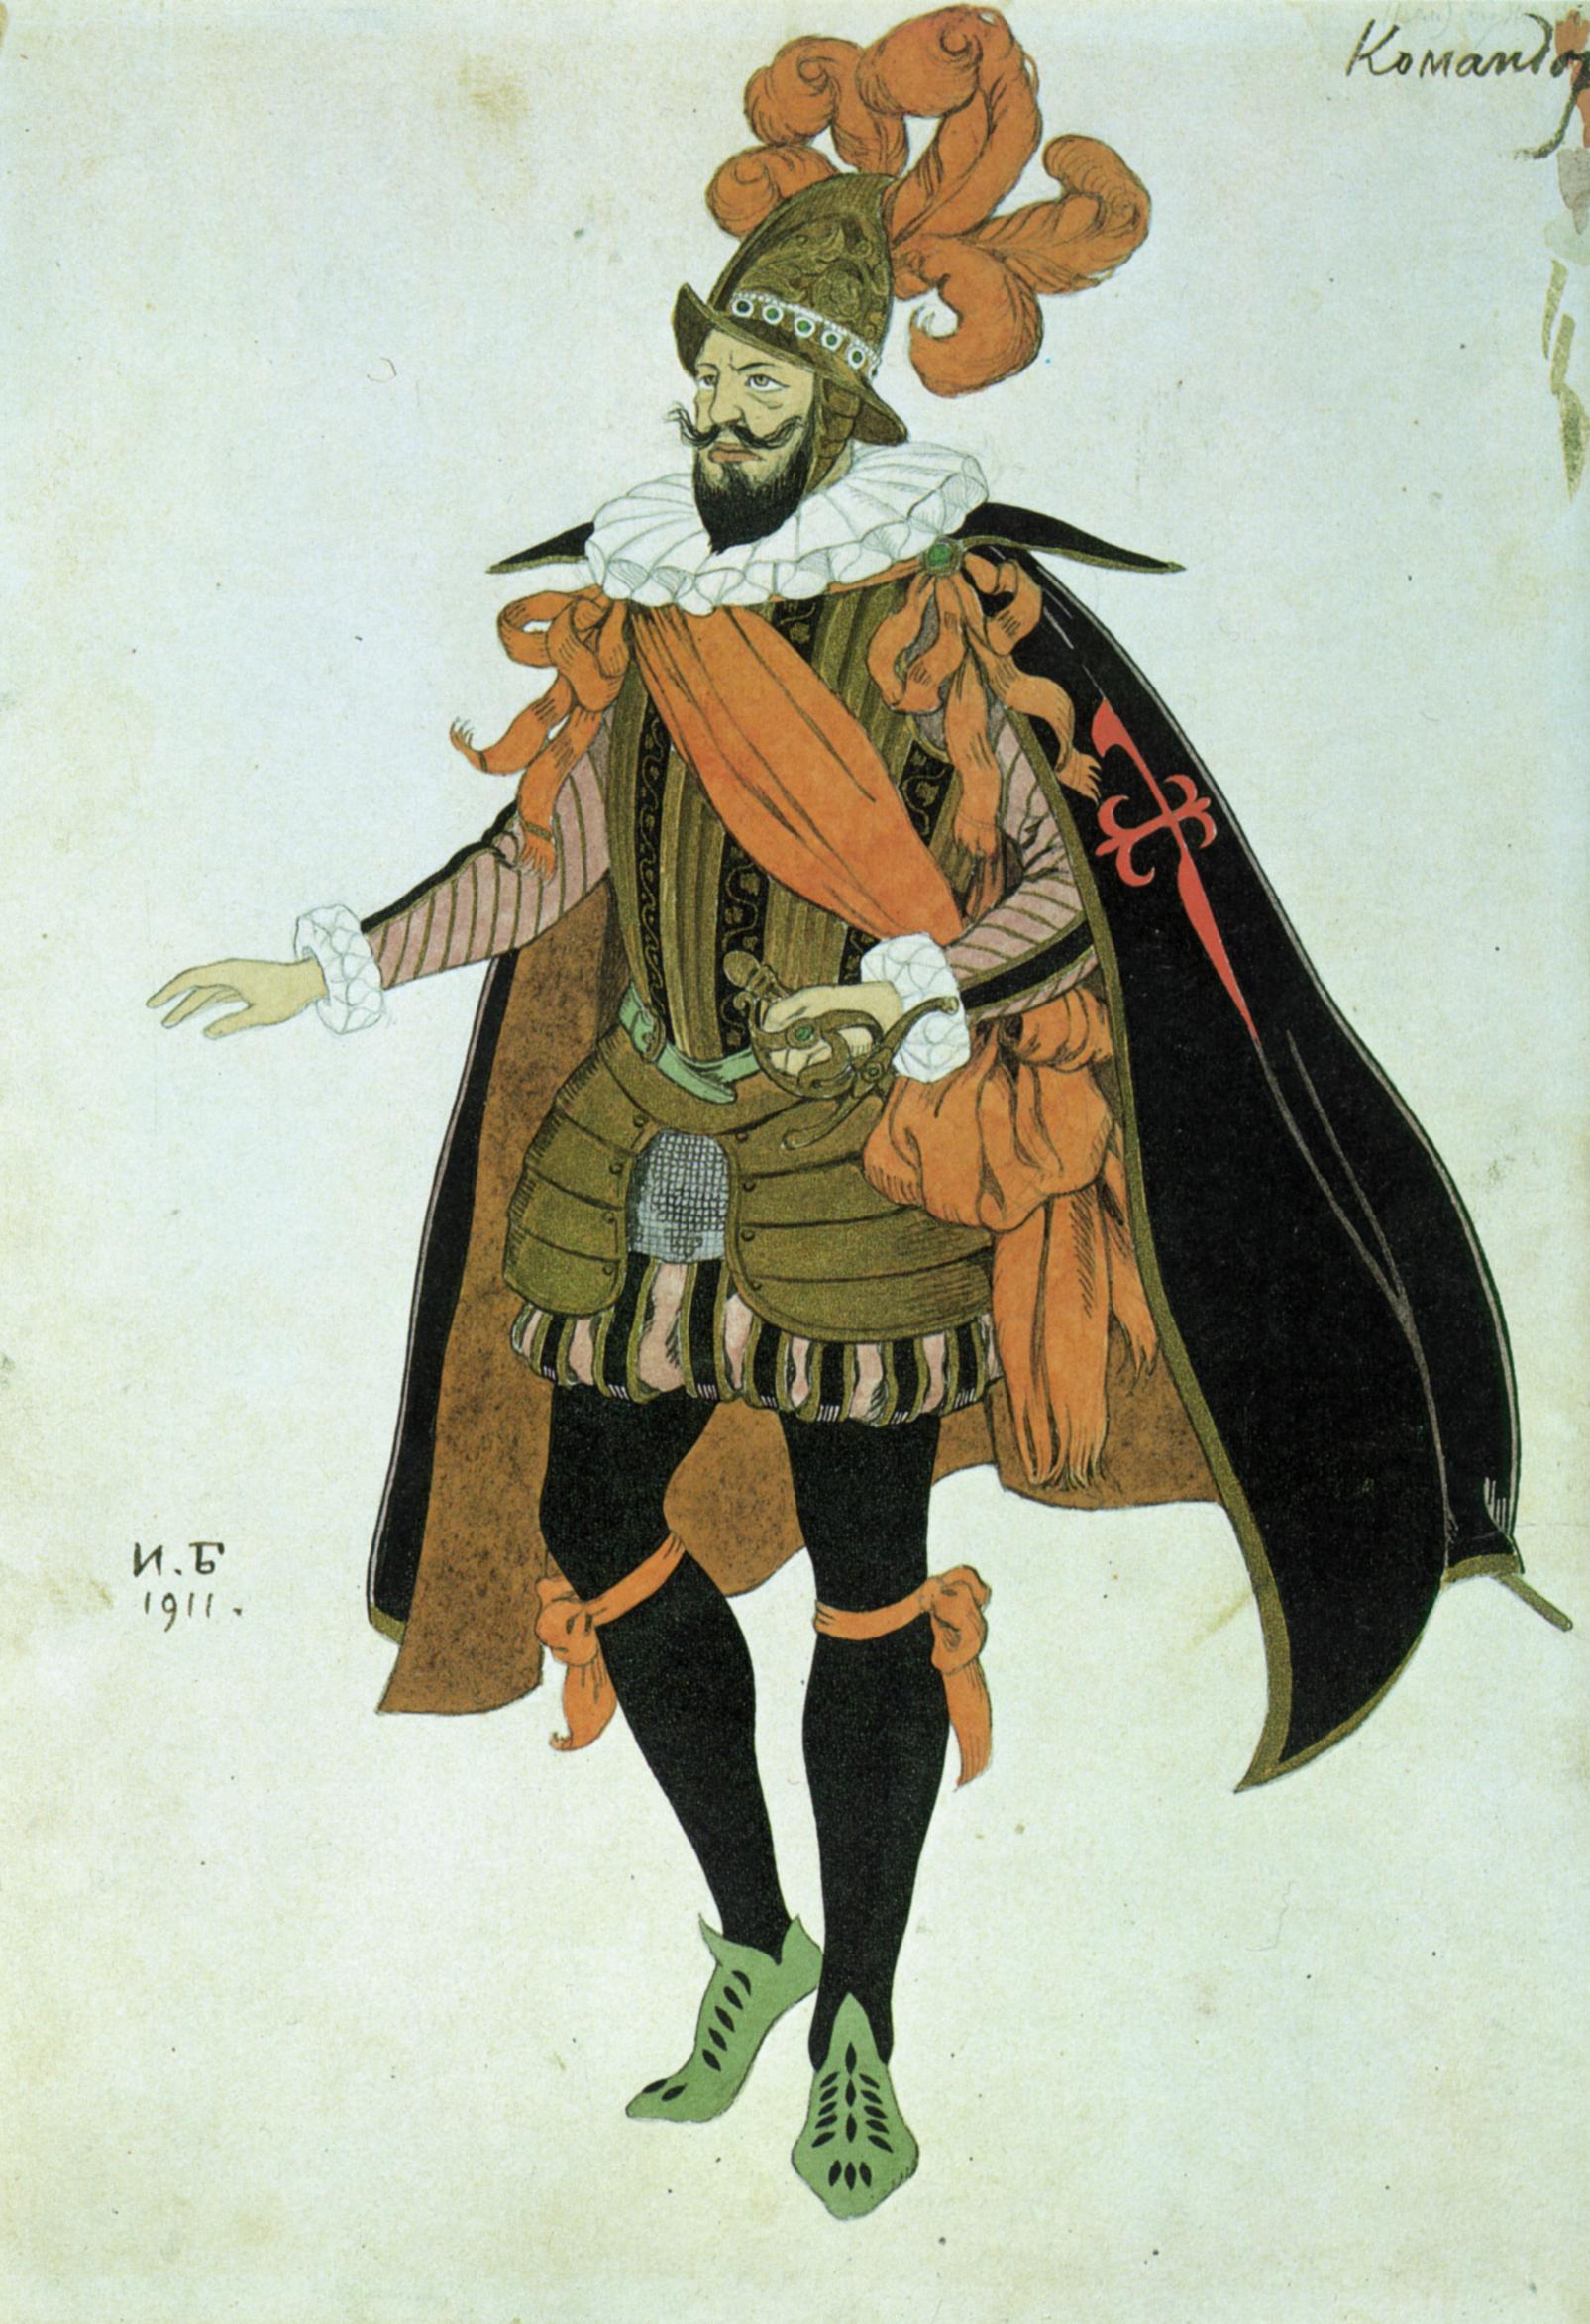 Ivan Bilibin - Comandor